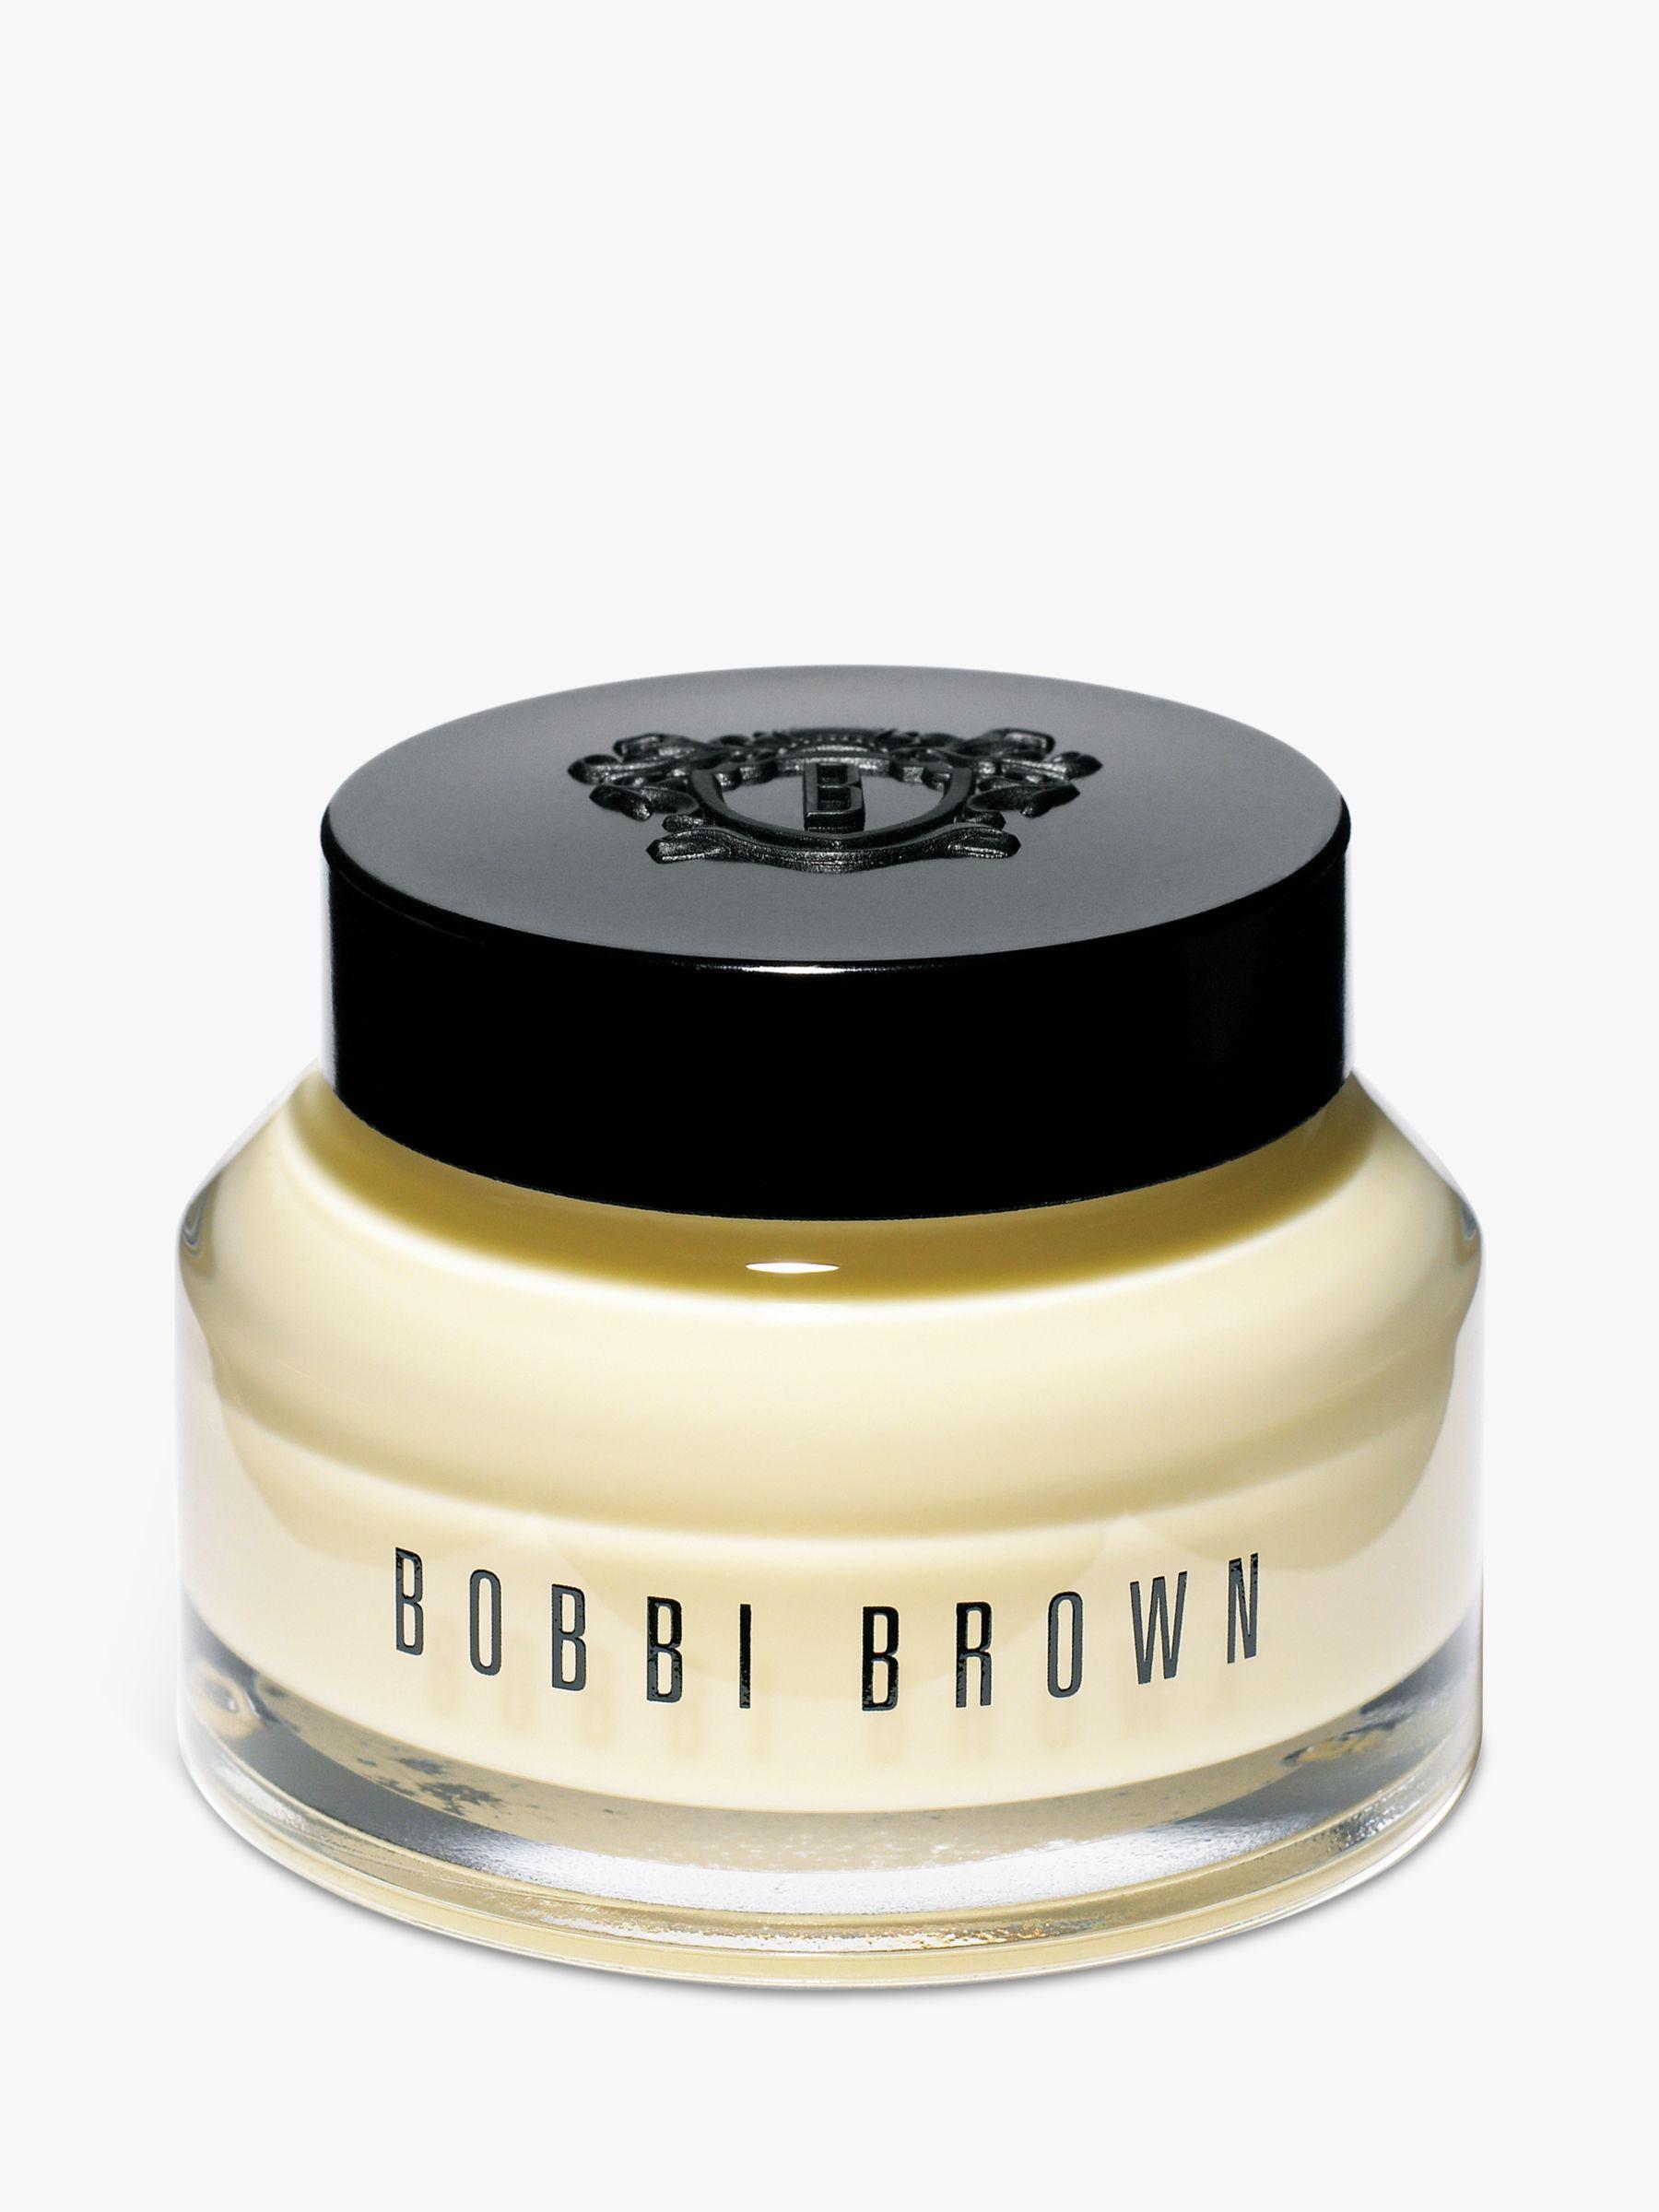 Bobbi Brown Bobbi Brown Vitamin Enriched Face Base, 50ml